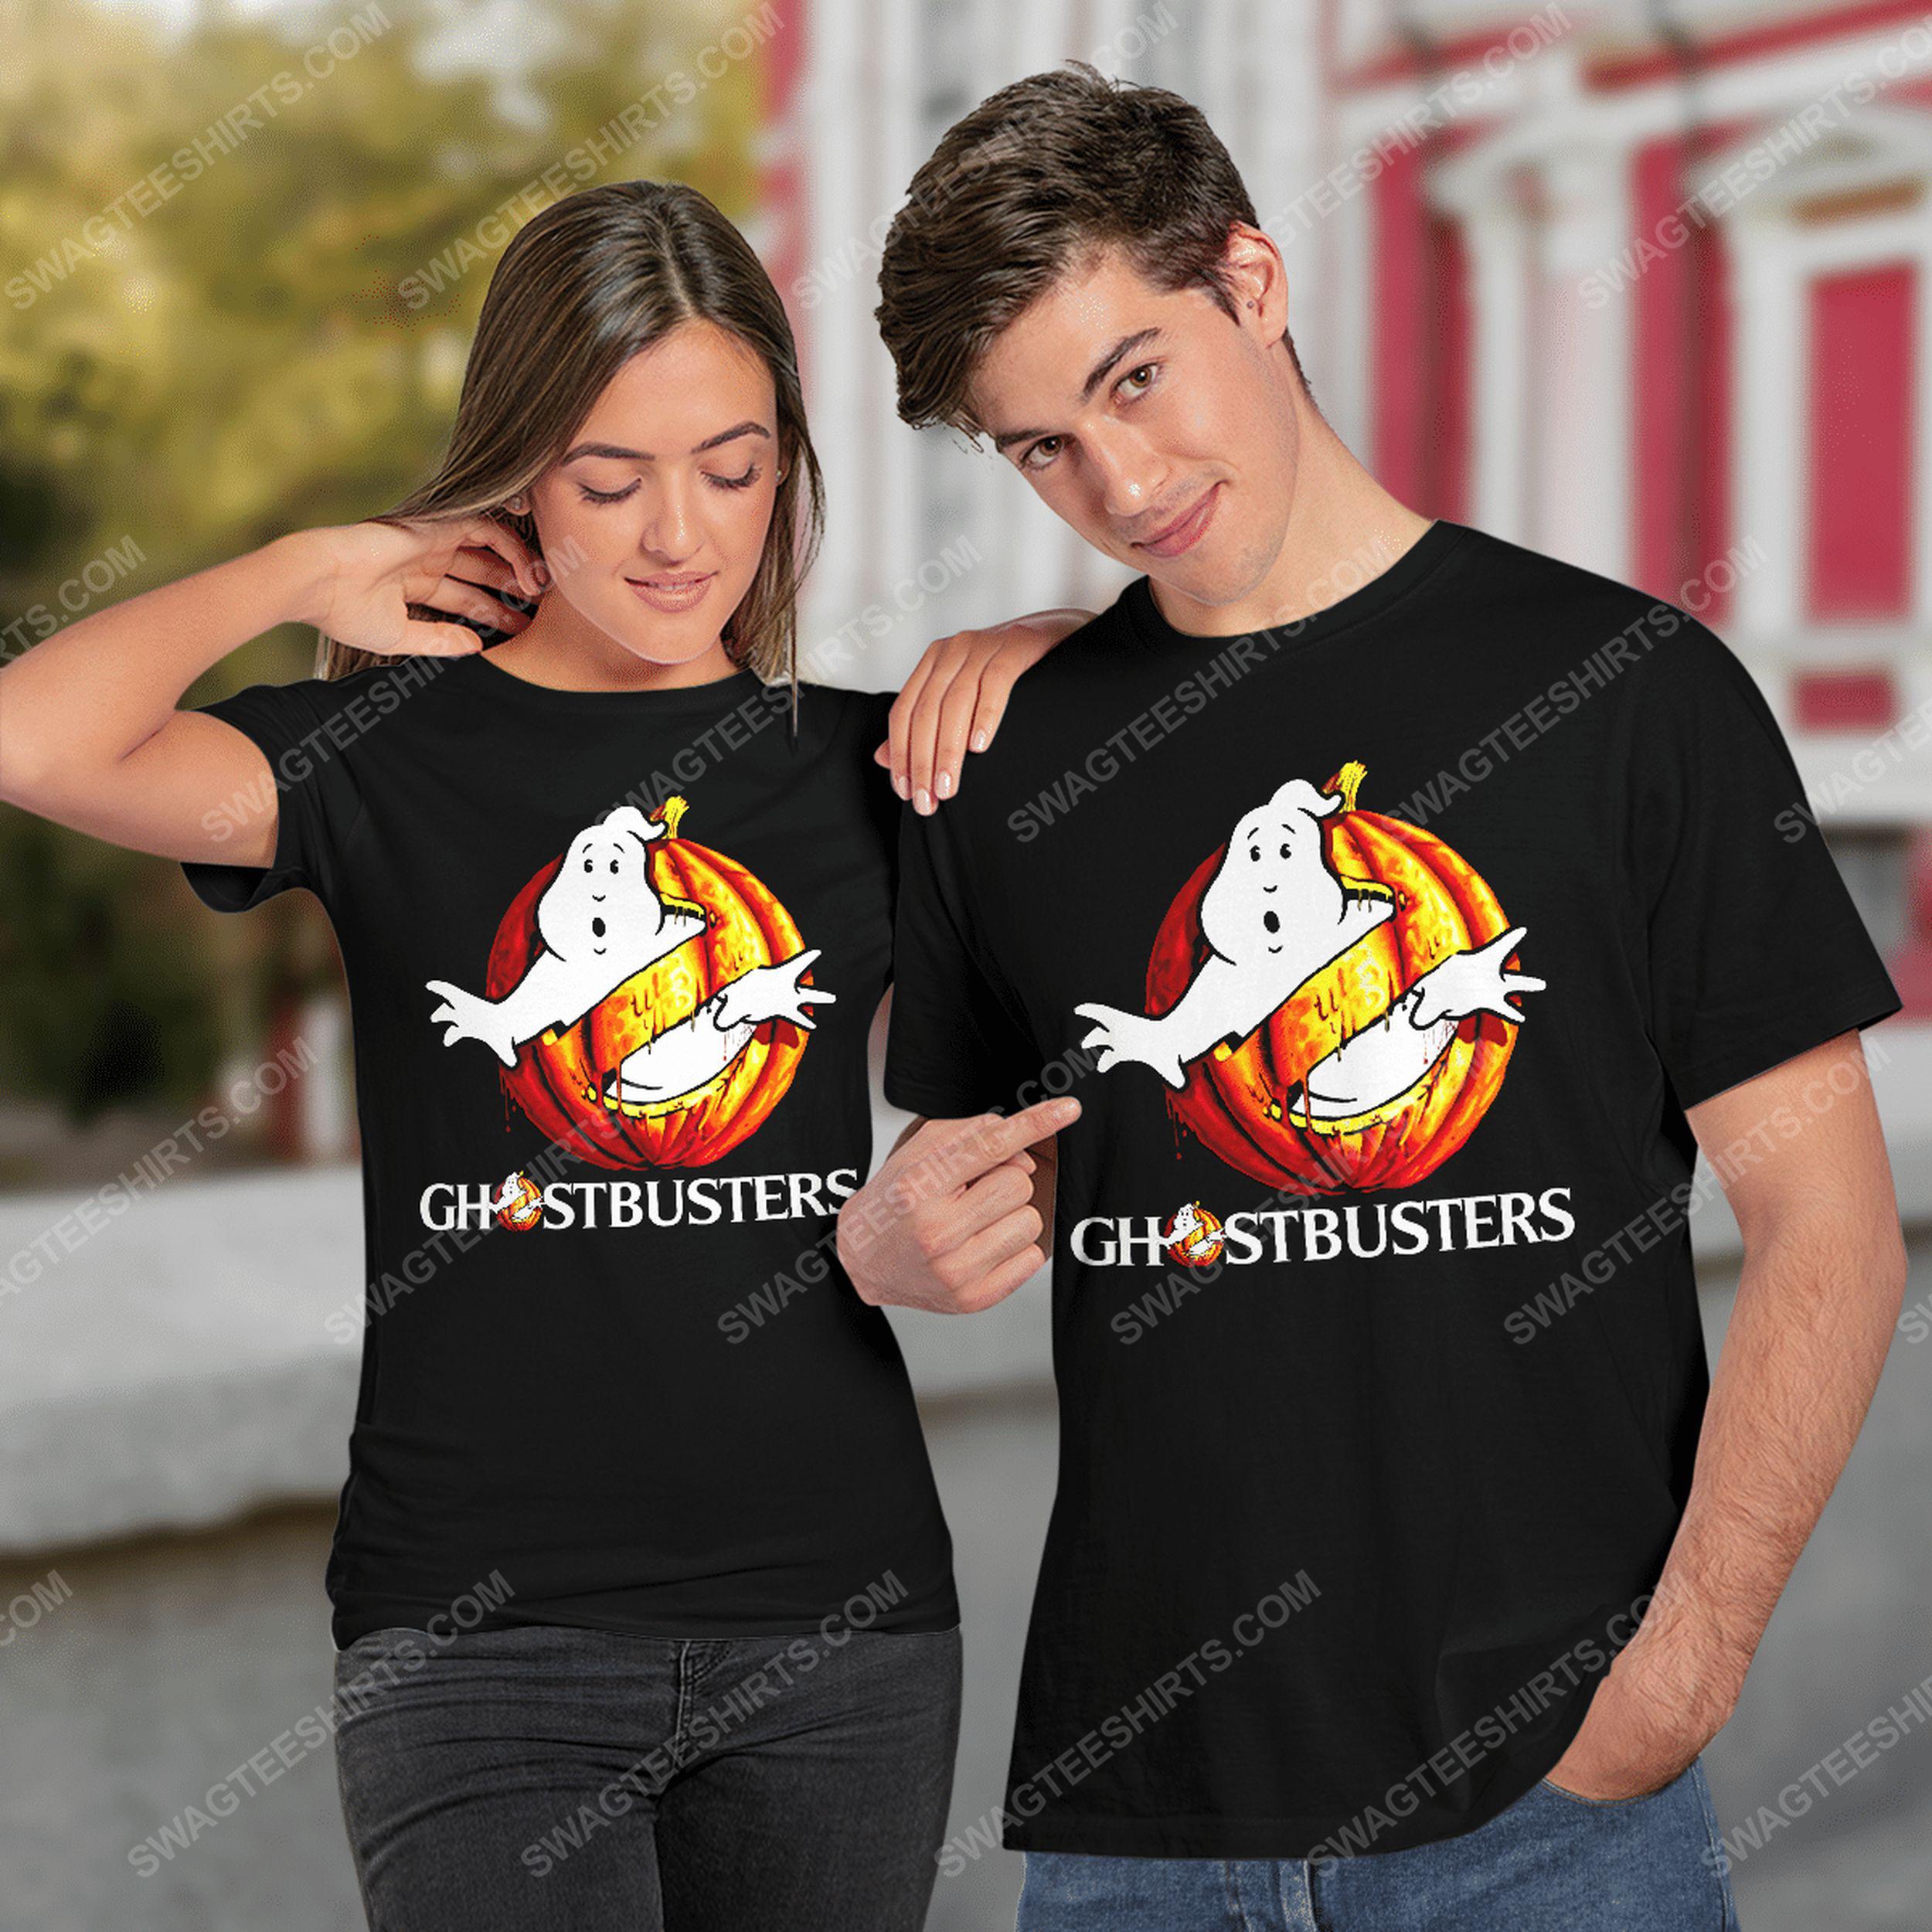 Ghostbusters with halloween pumpkin tshirt(1)